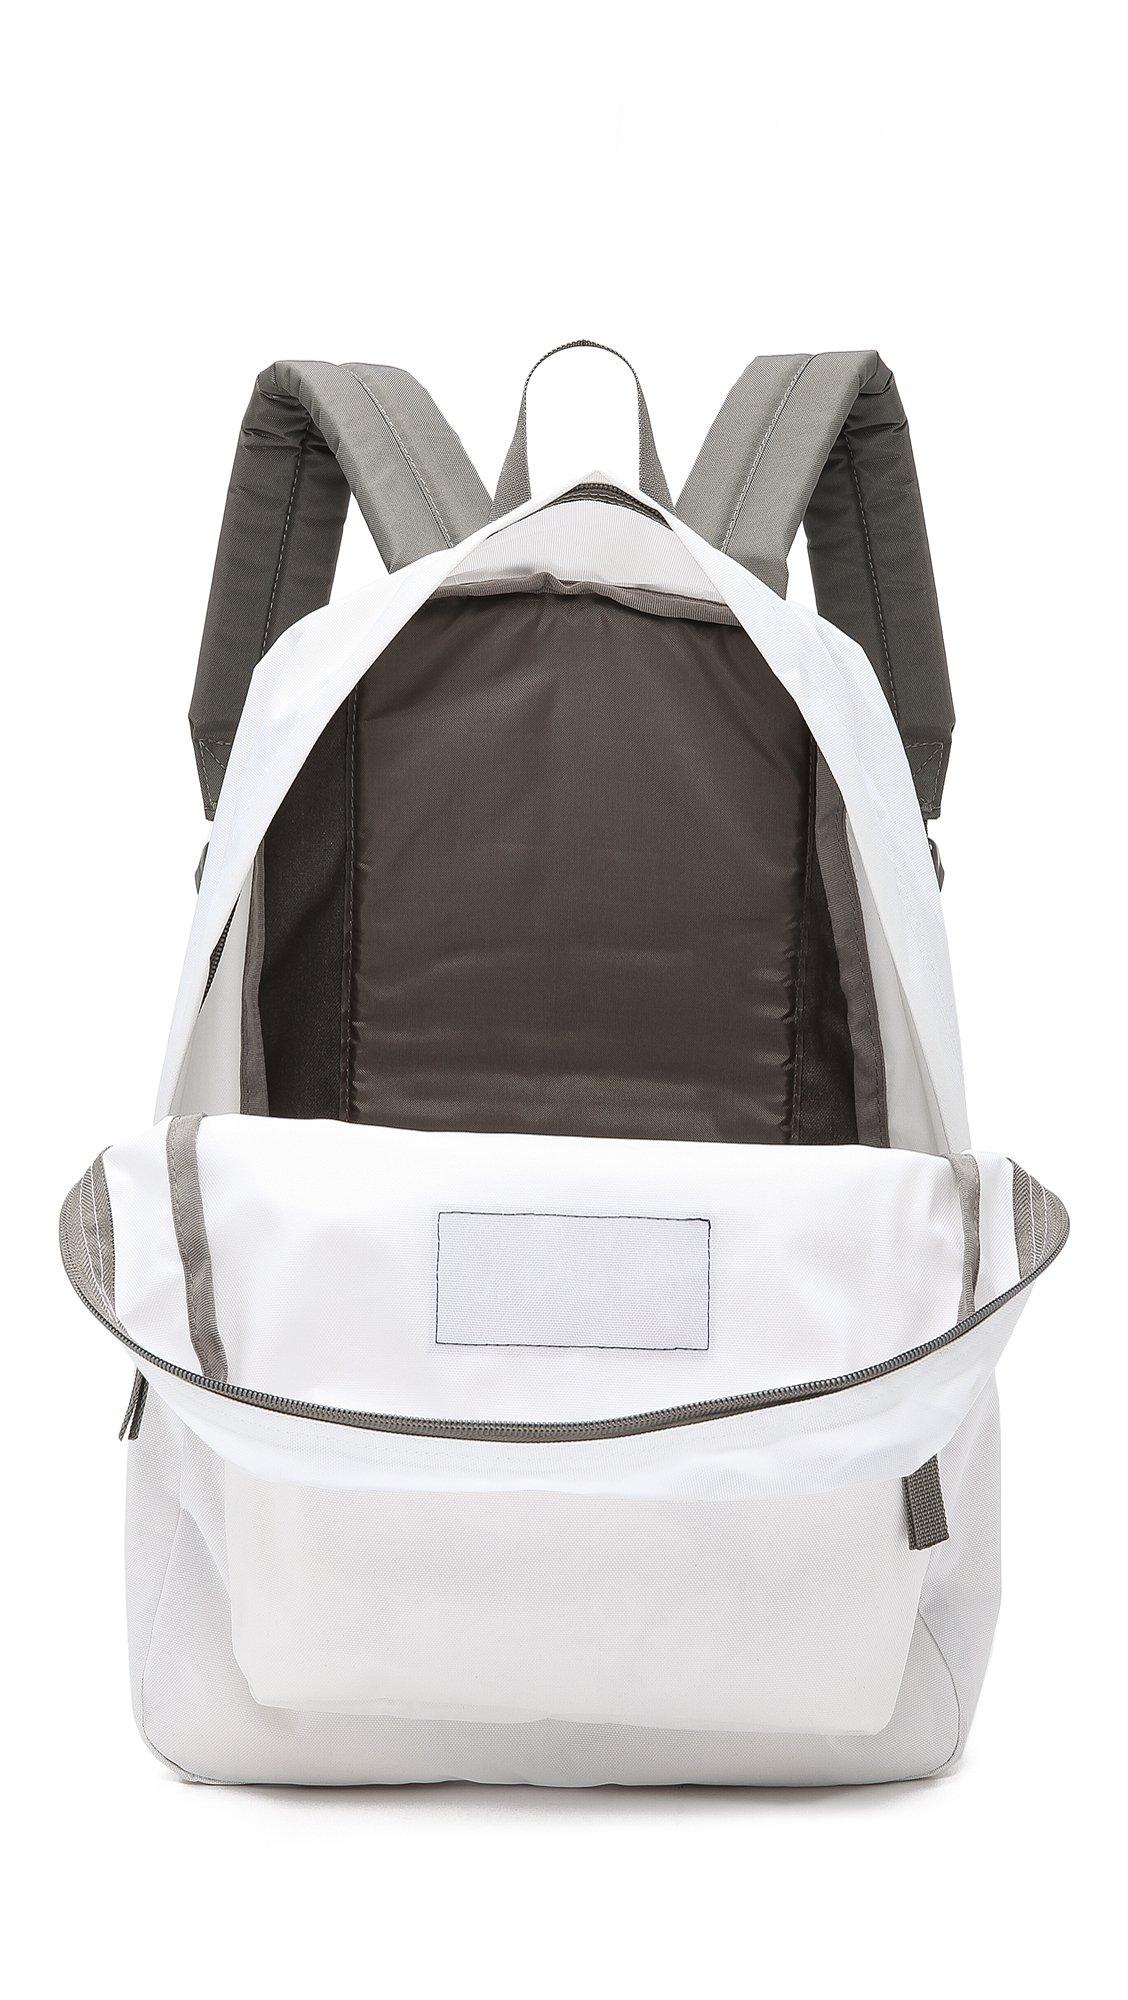 392e1a65bf Lyst - Jansport Superbreak Backpack in White for Men